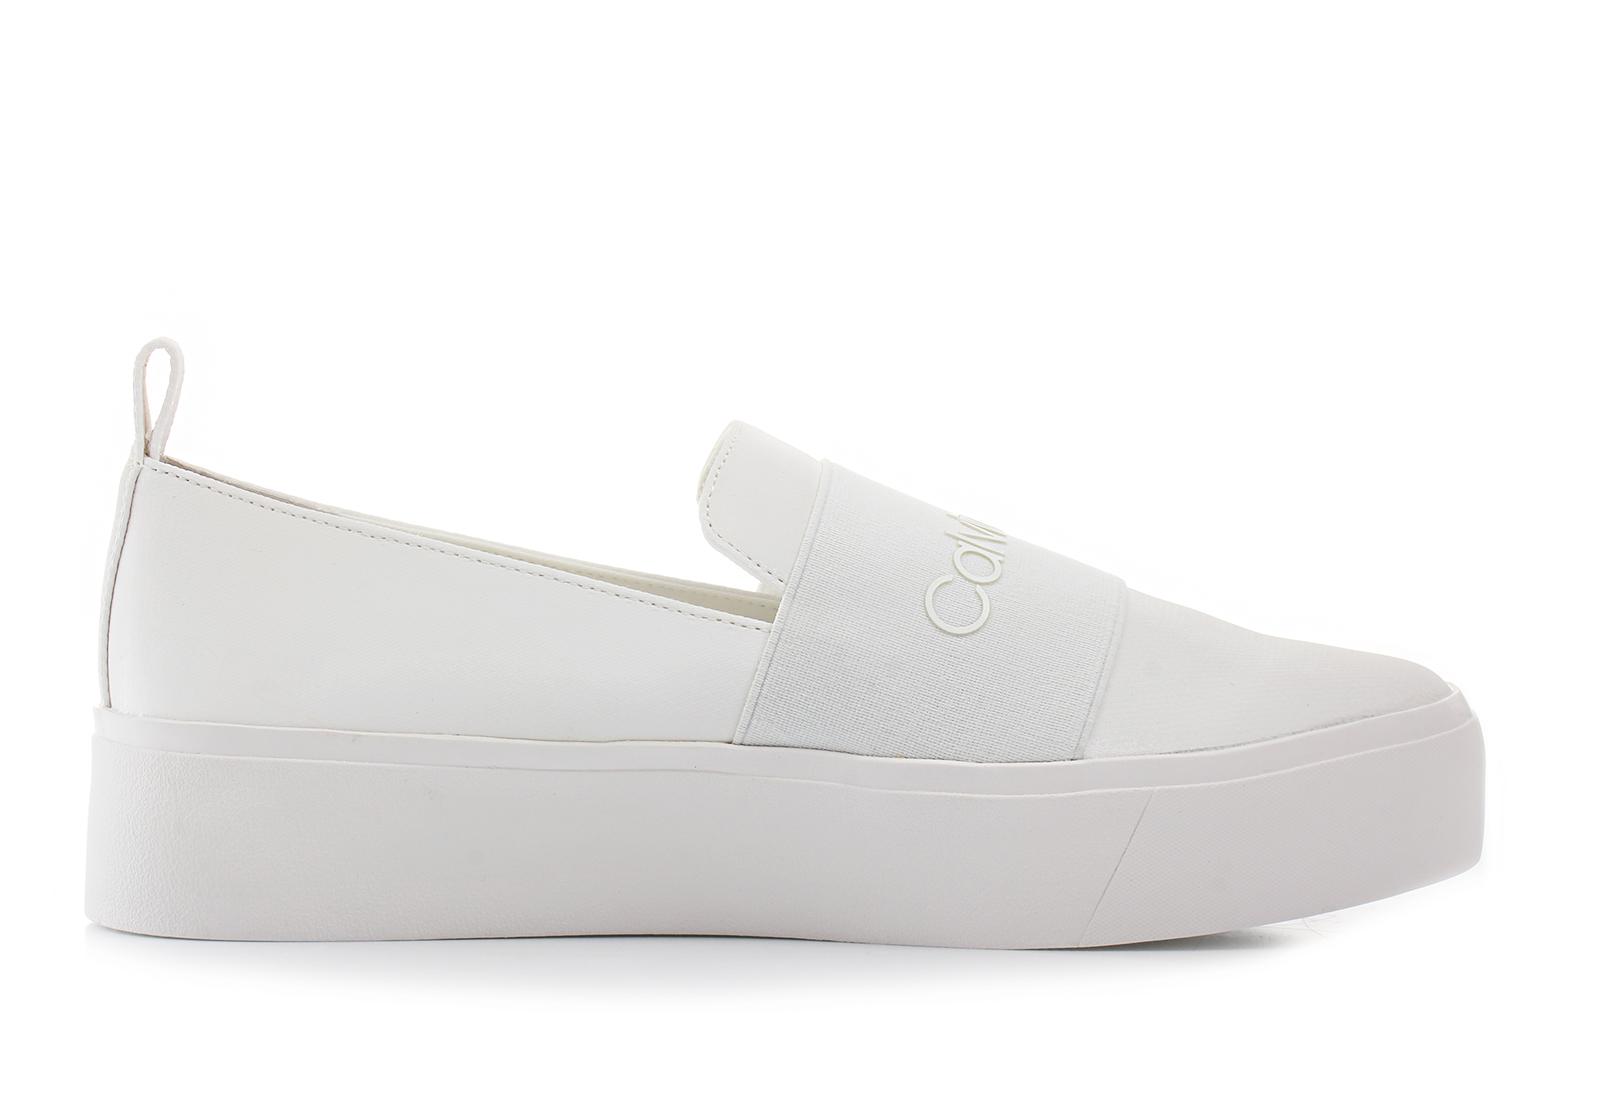 Calvin Klein Black Label Shoes - Jacinta - E6674-PLI - Online shop ... a38f0fd217